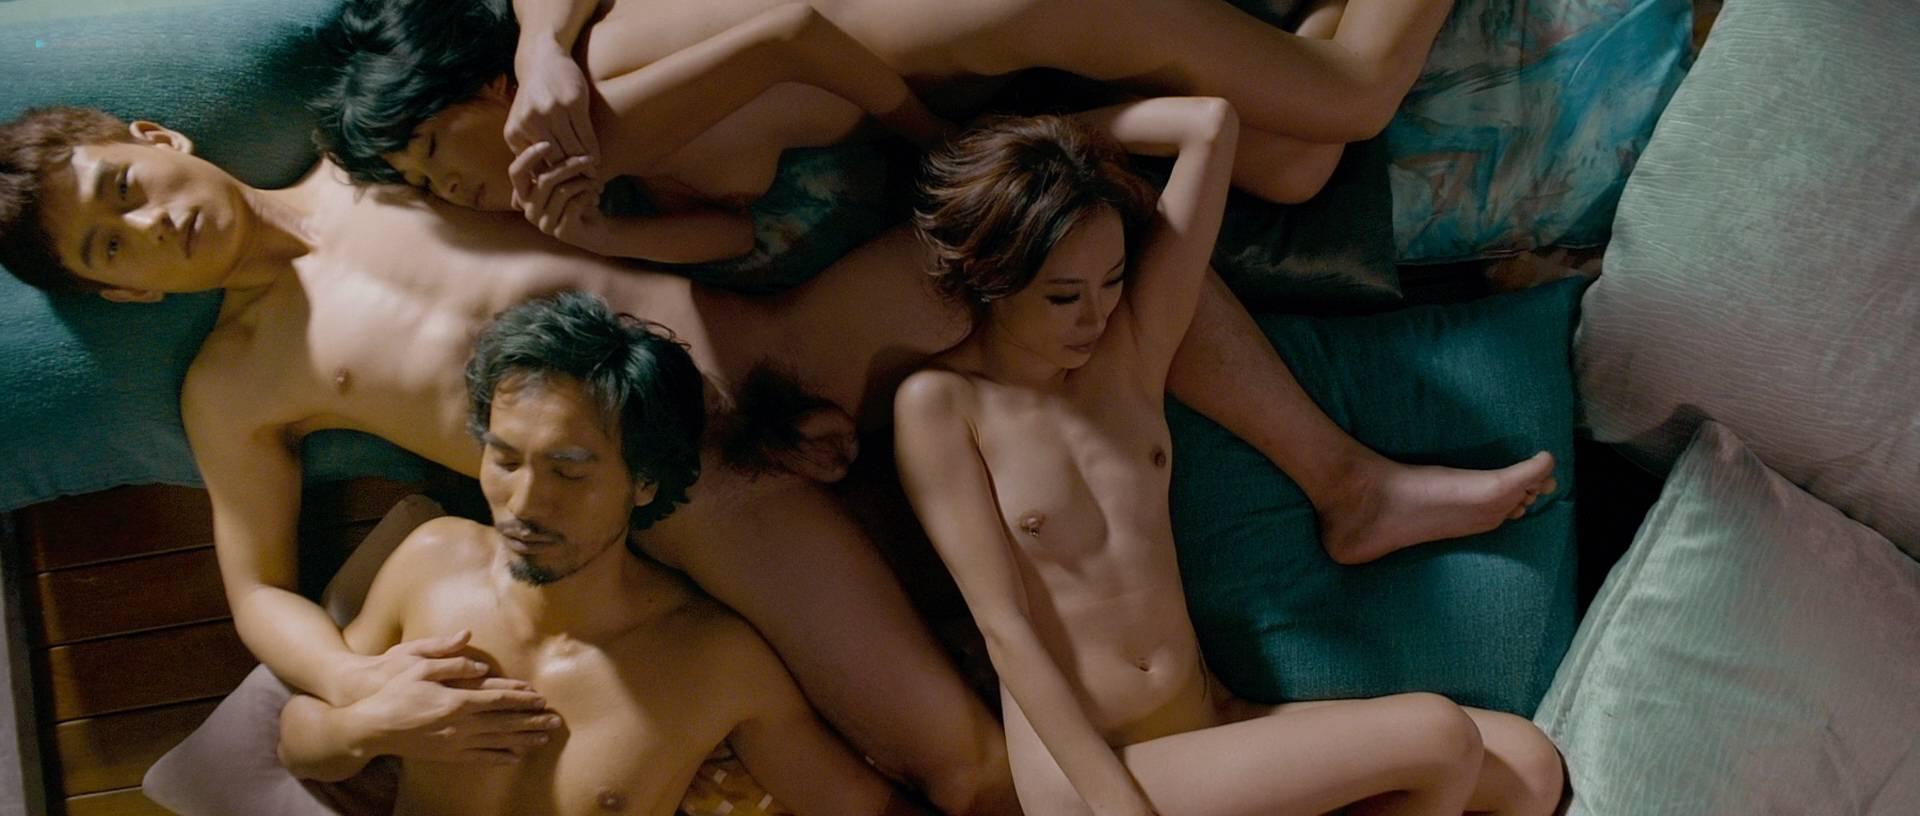 Scarlett alice johnson topless pics 934